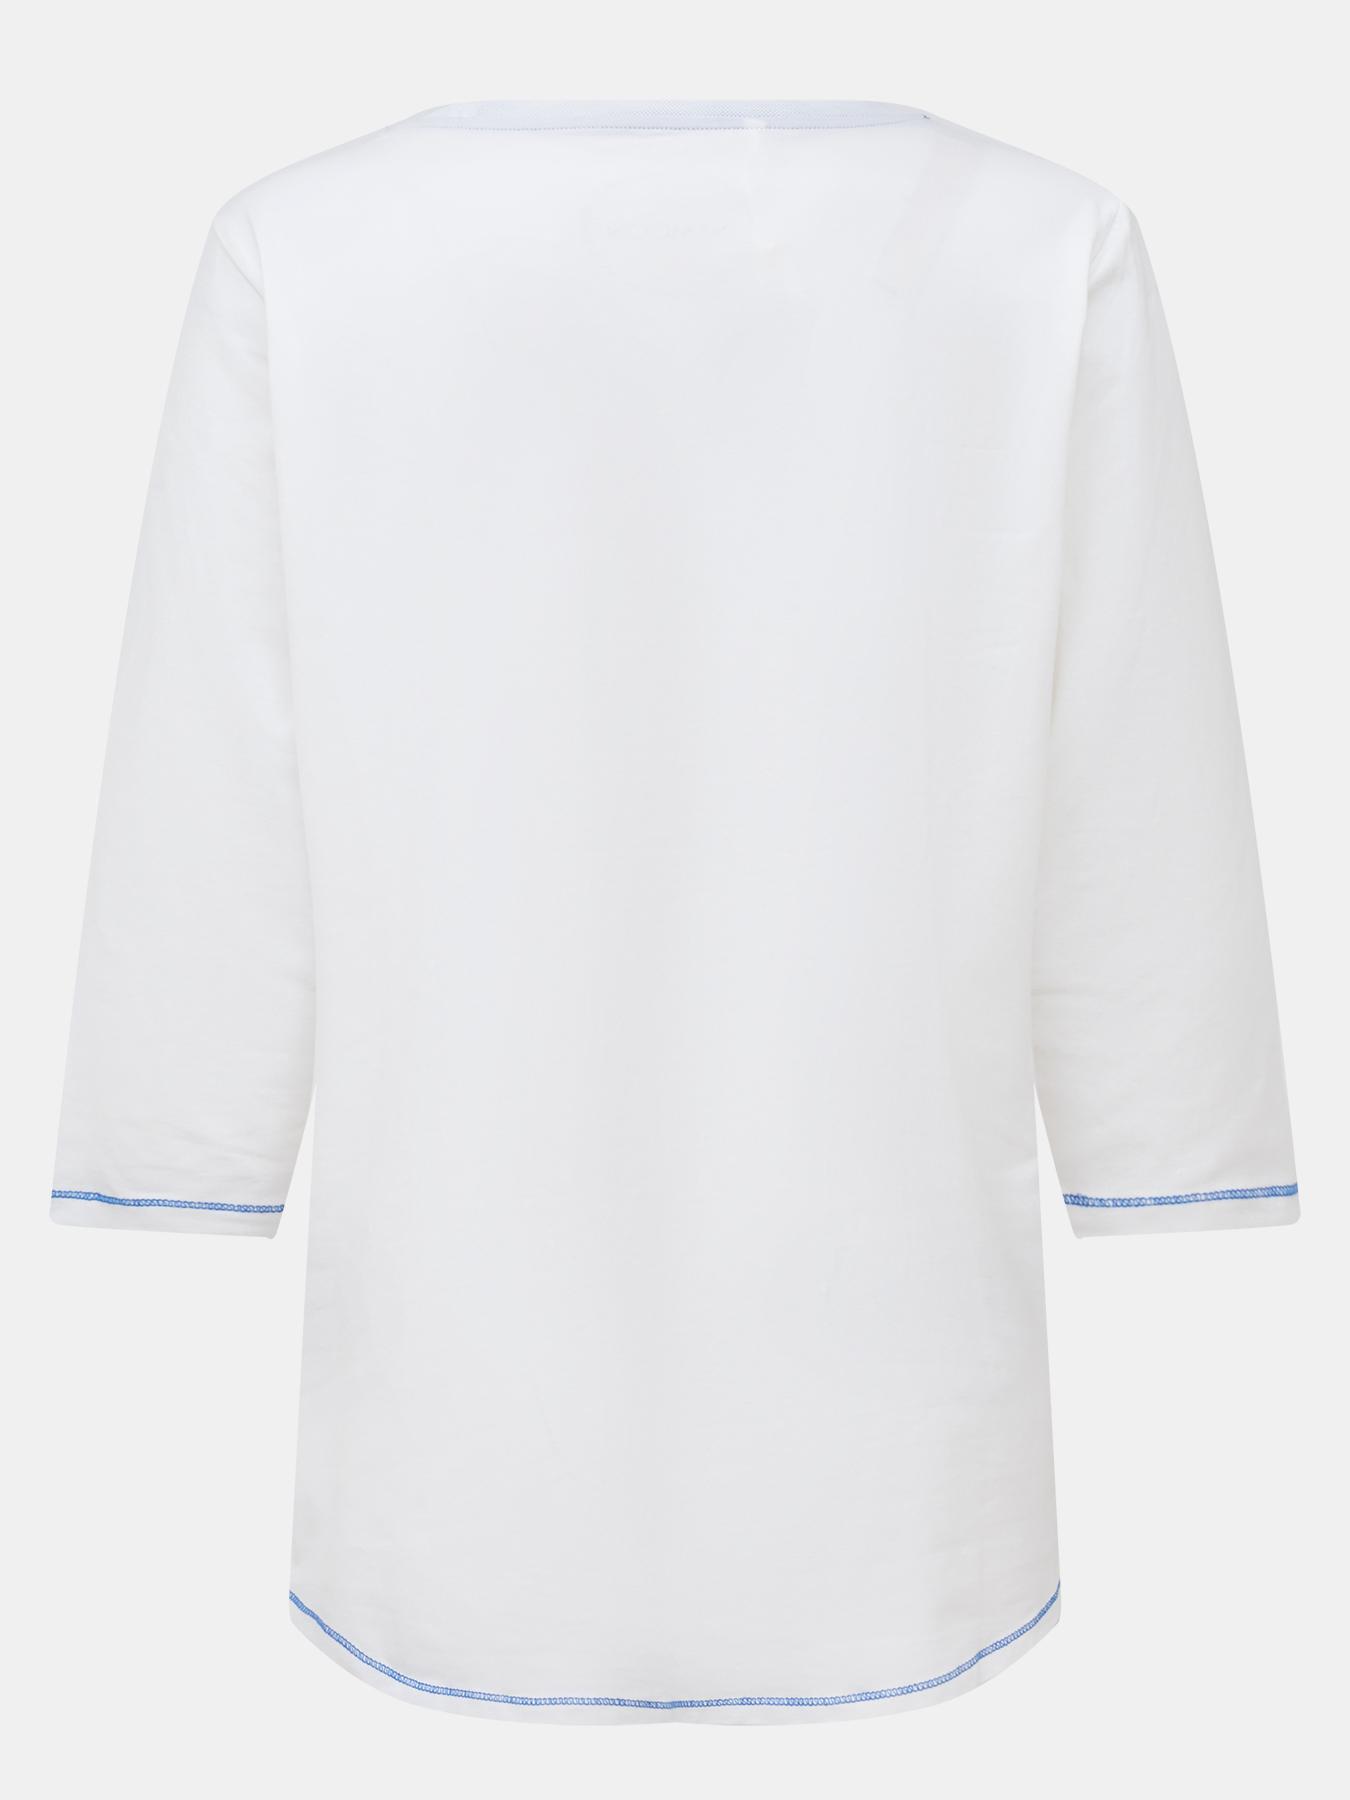 Фуфайка (футболка) Samoon Лонгслив